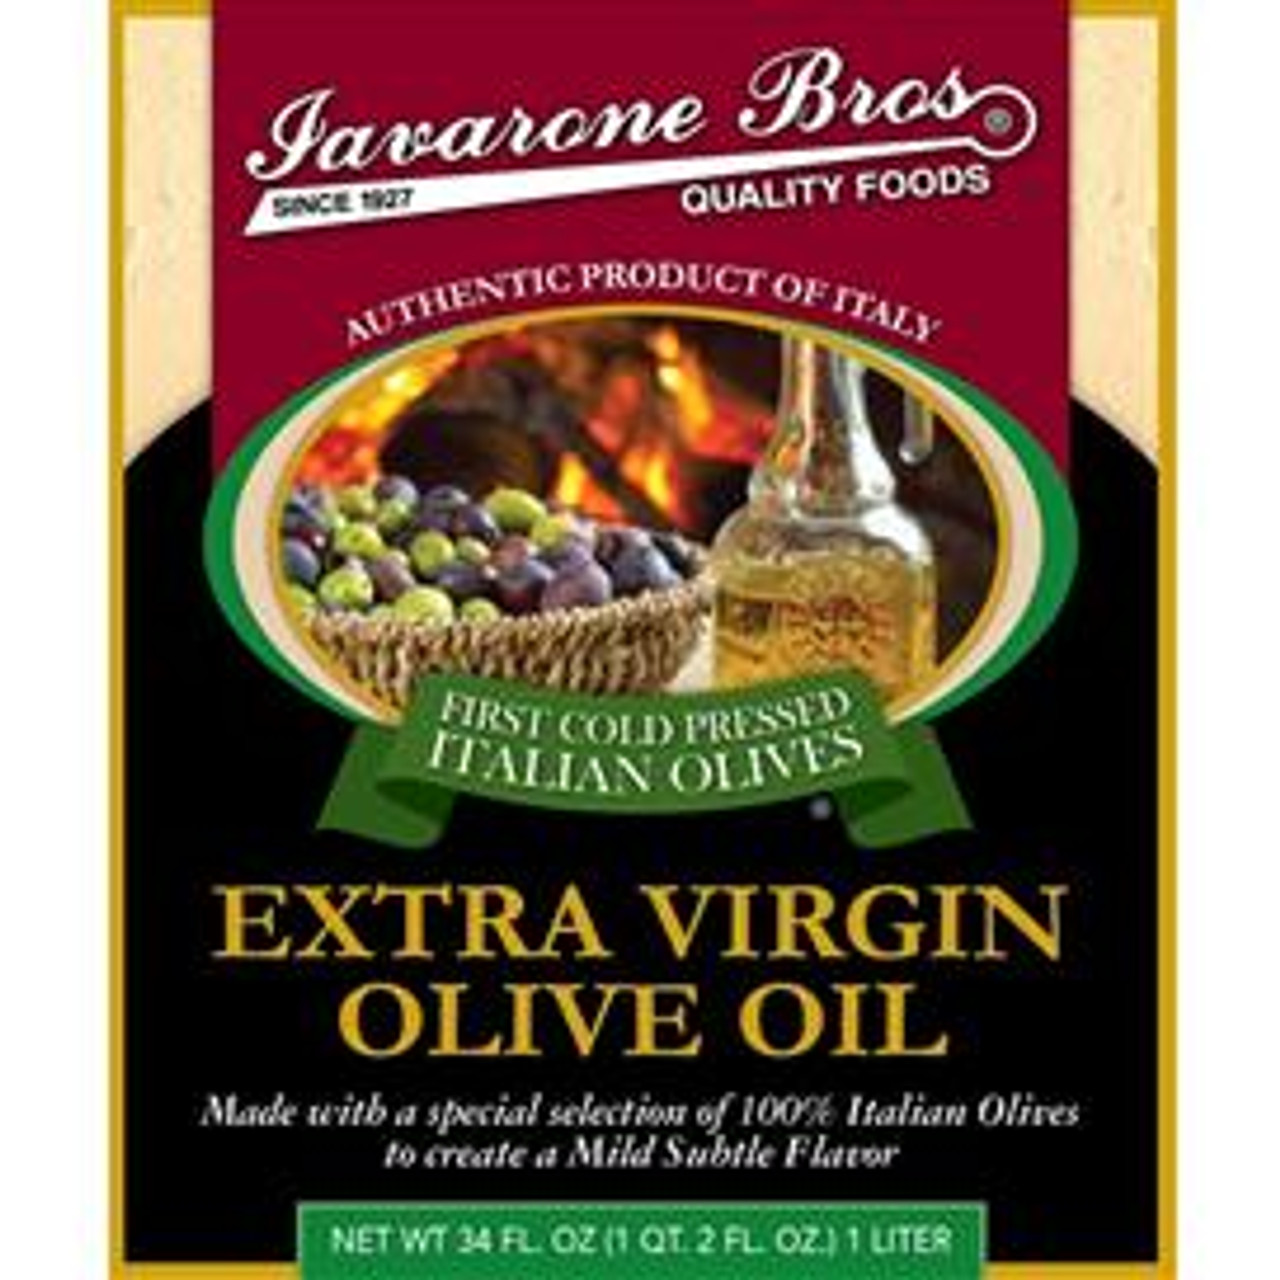 Iavarone Bros Own Extra Virgin Olive Oil